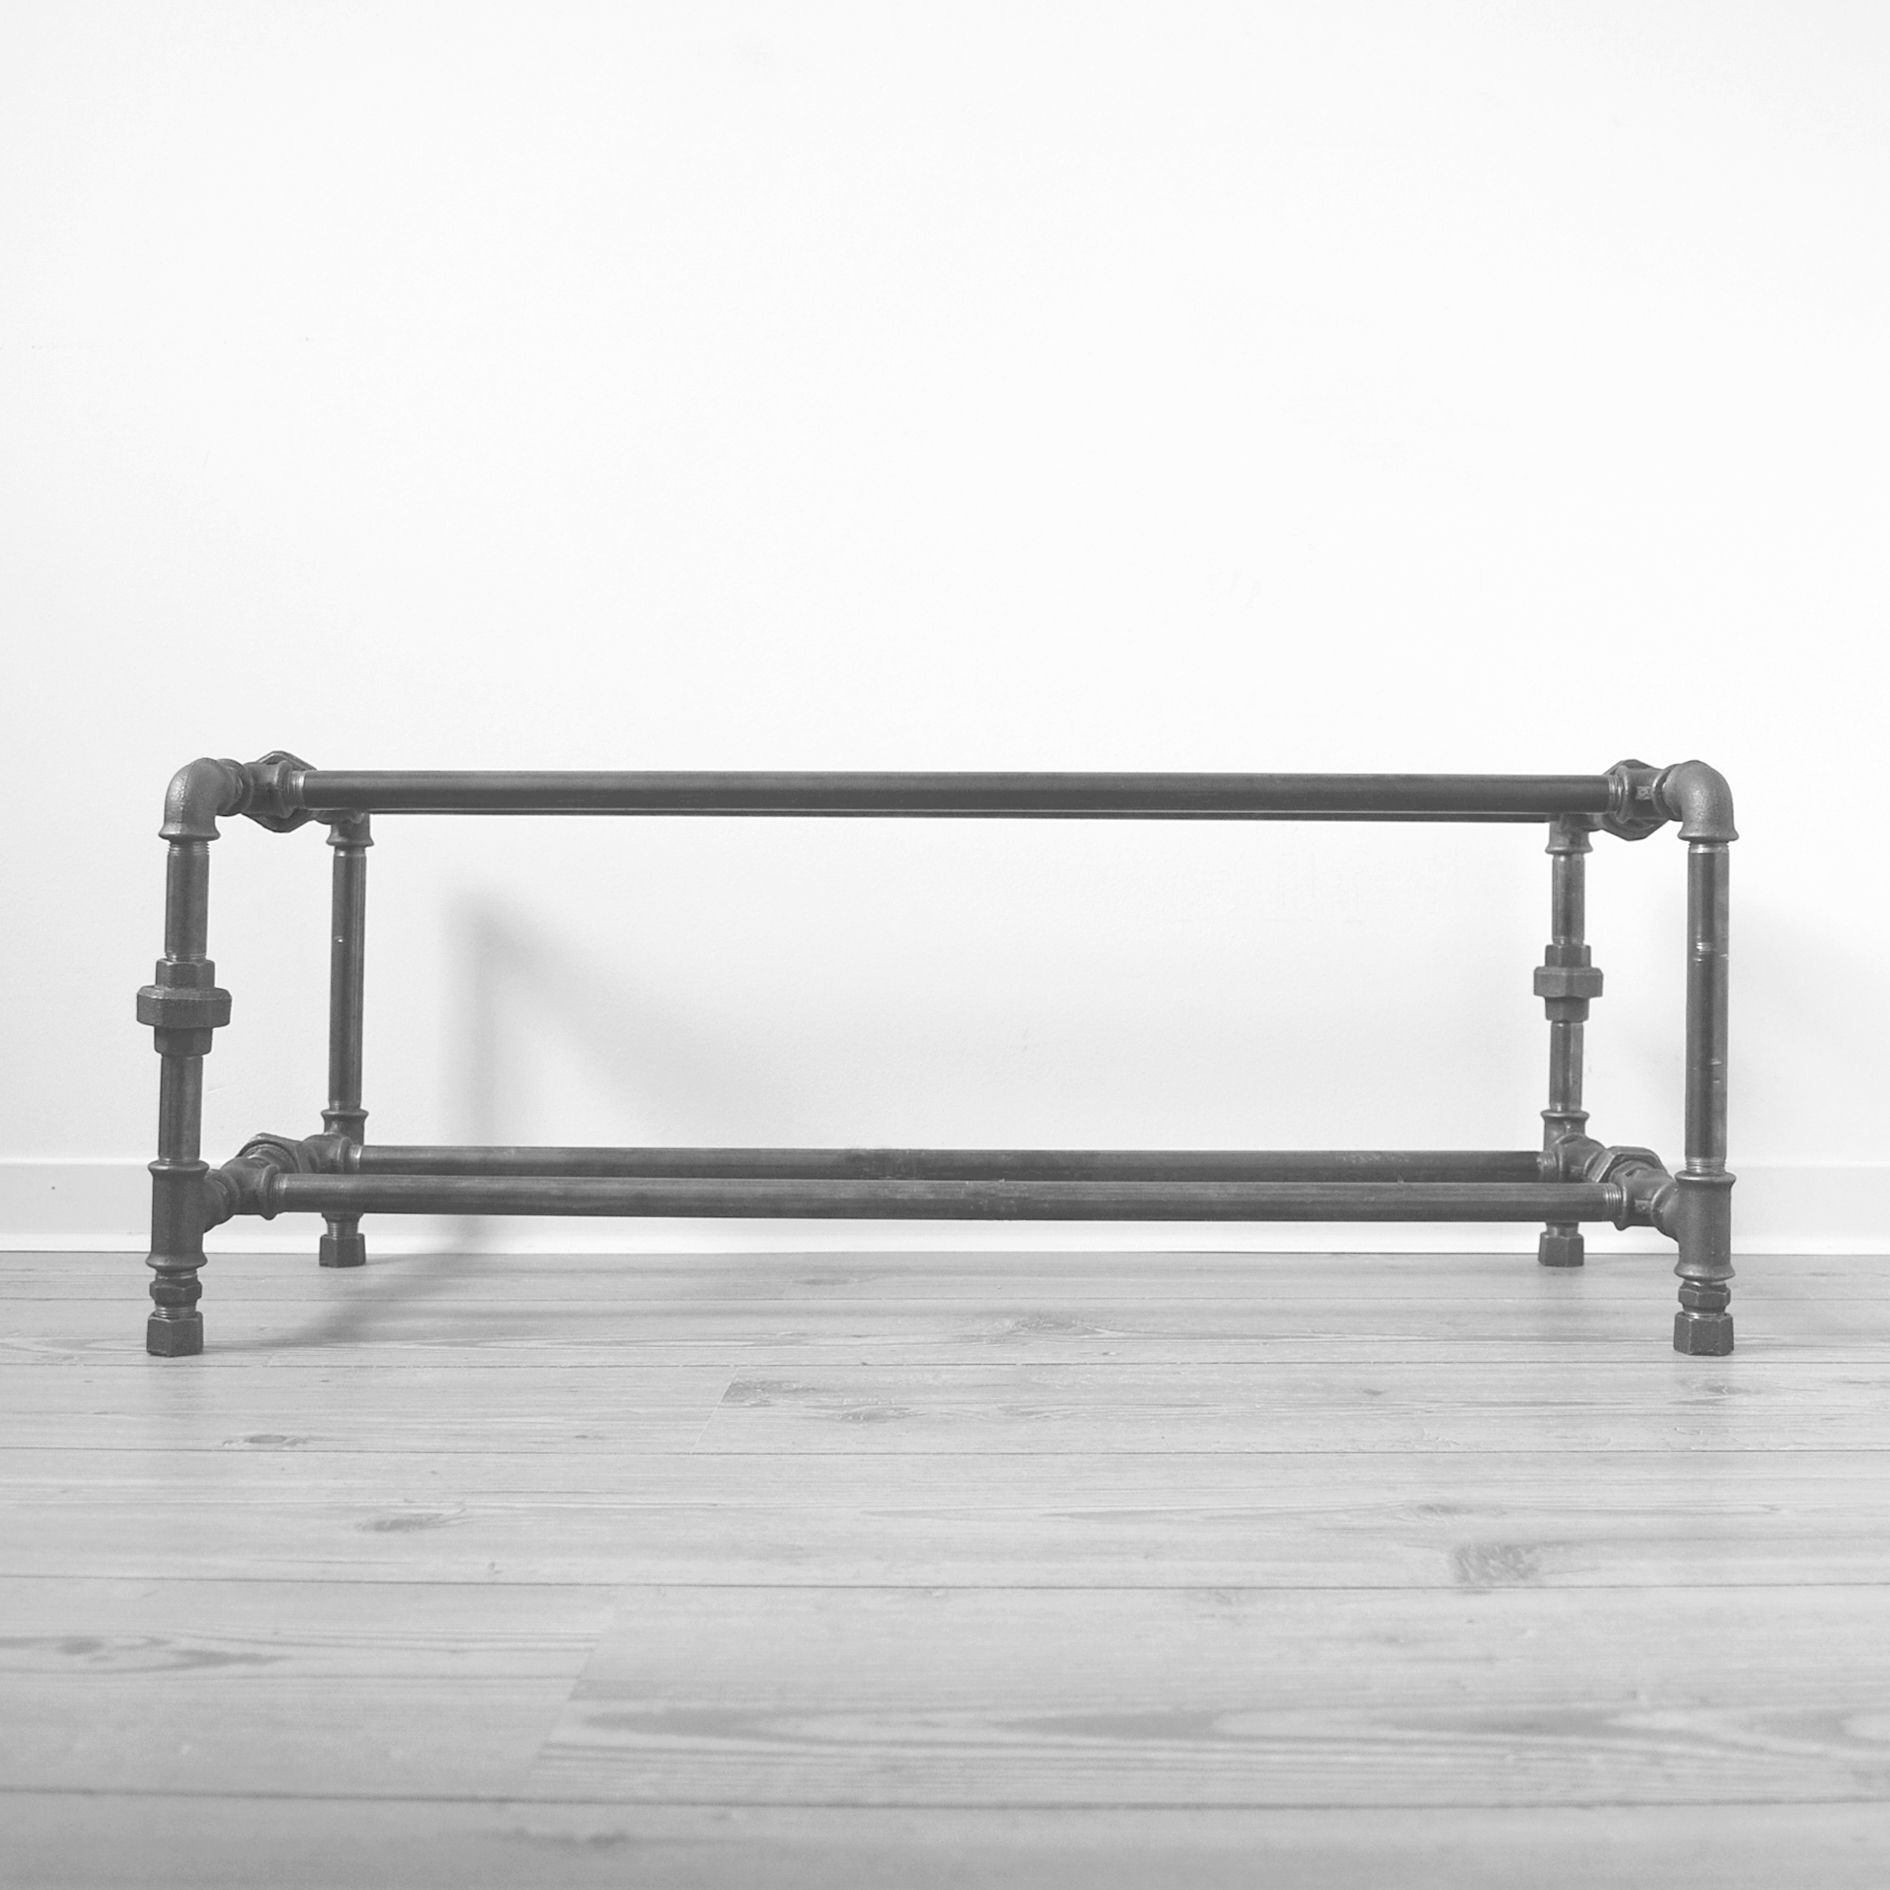 schuhregal aus stahlrohr steel pipe shoe rack various steel pipe design pinterest. Black Bedroom Furniture Sets. Home Design Ideas